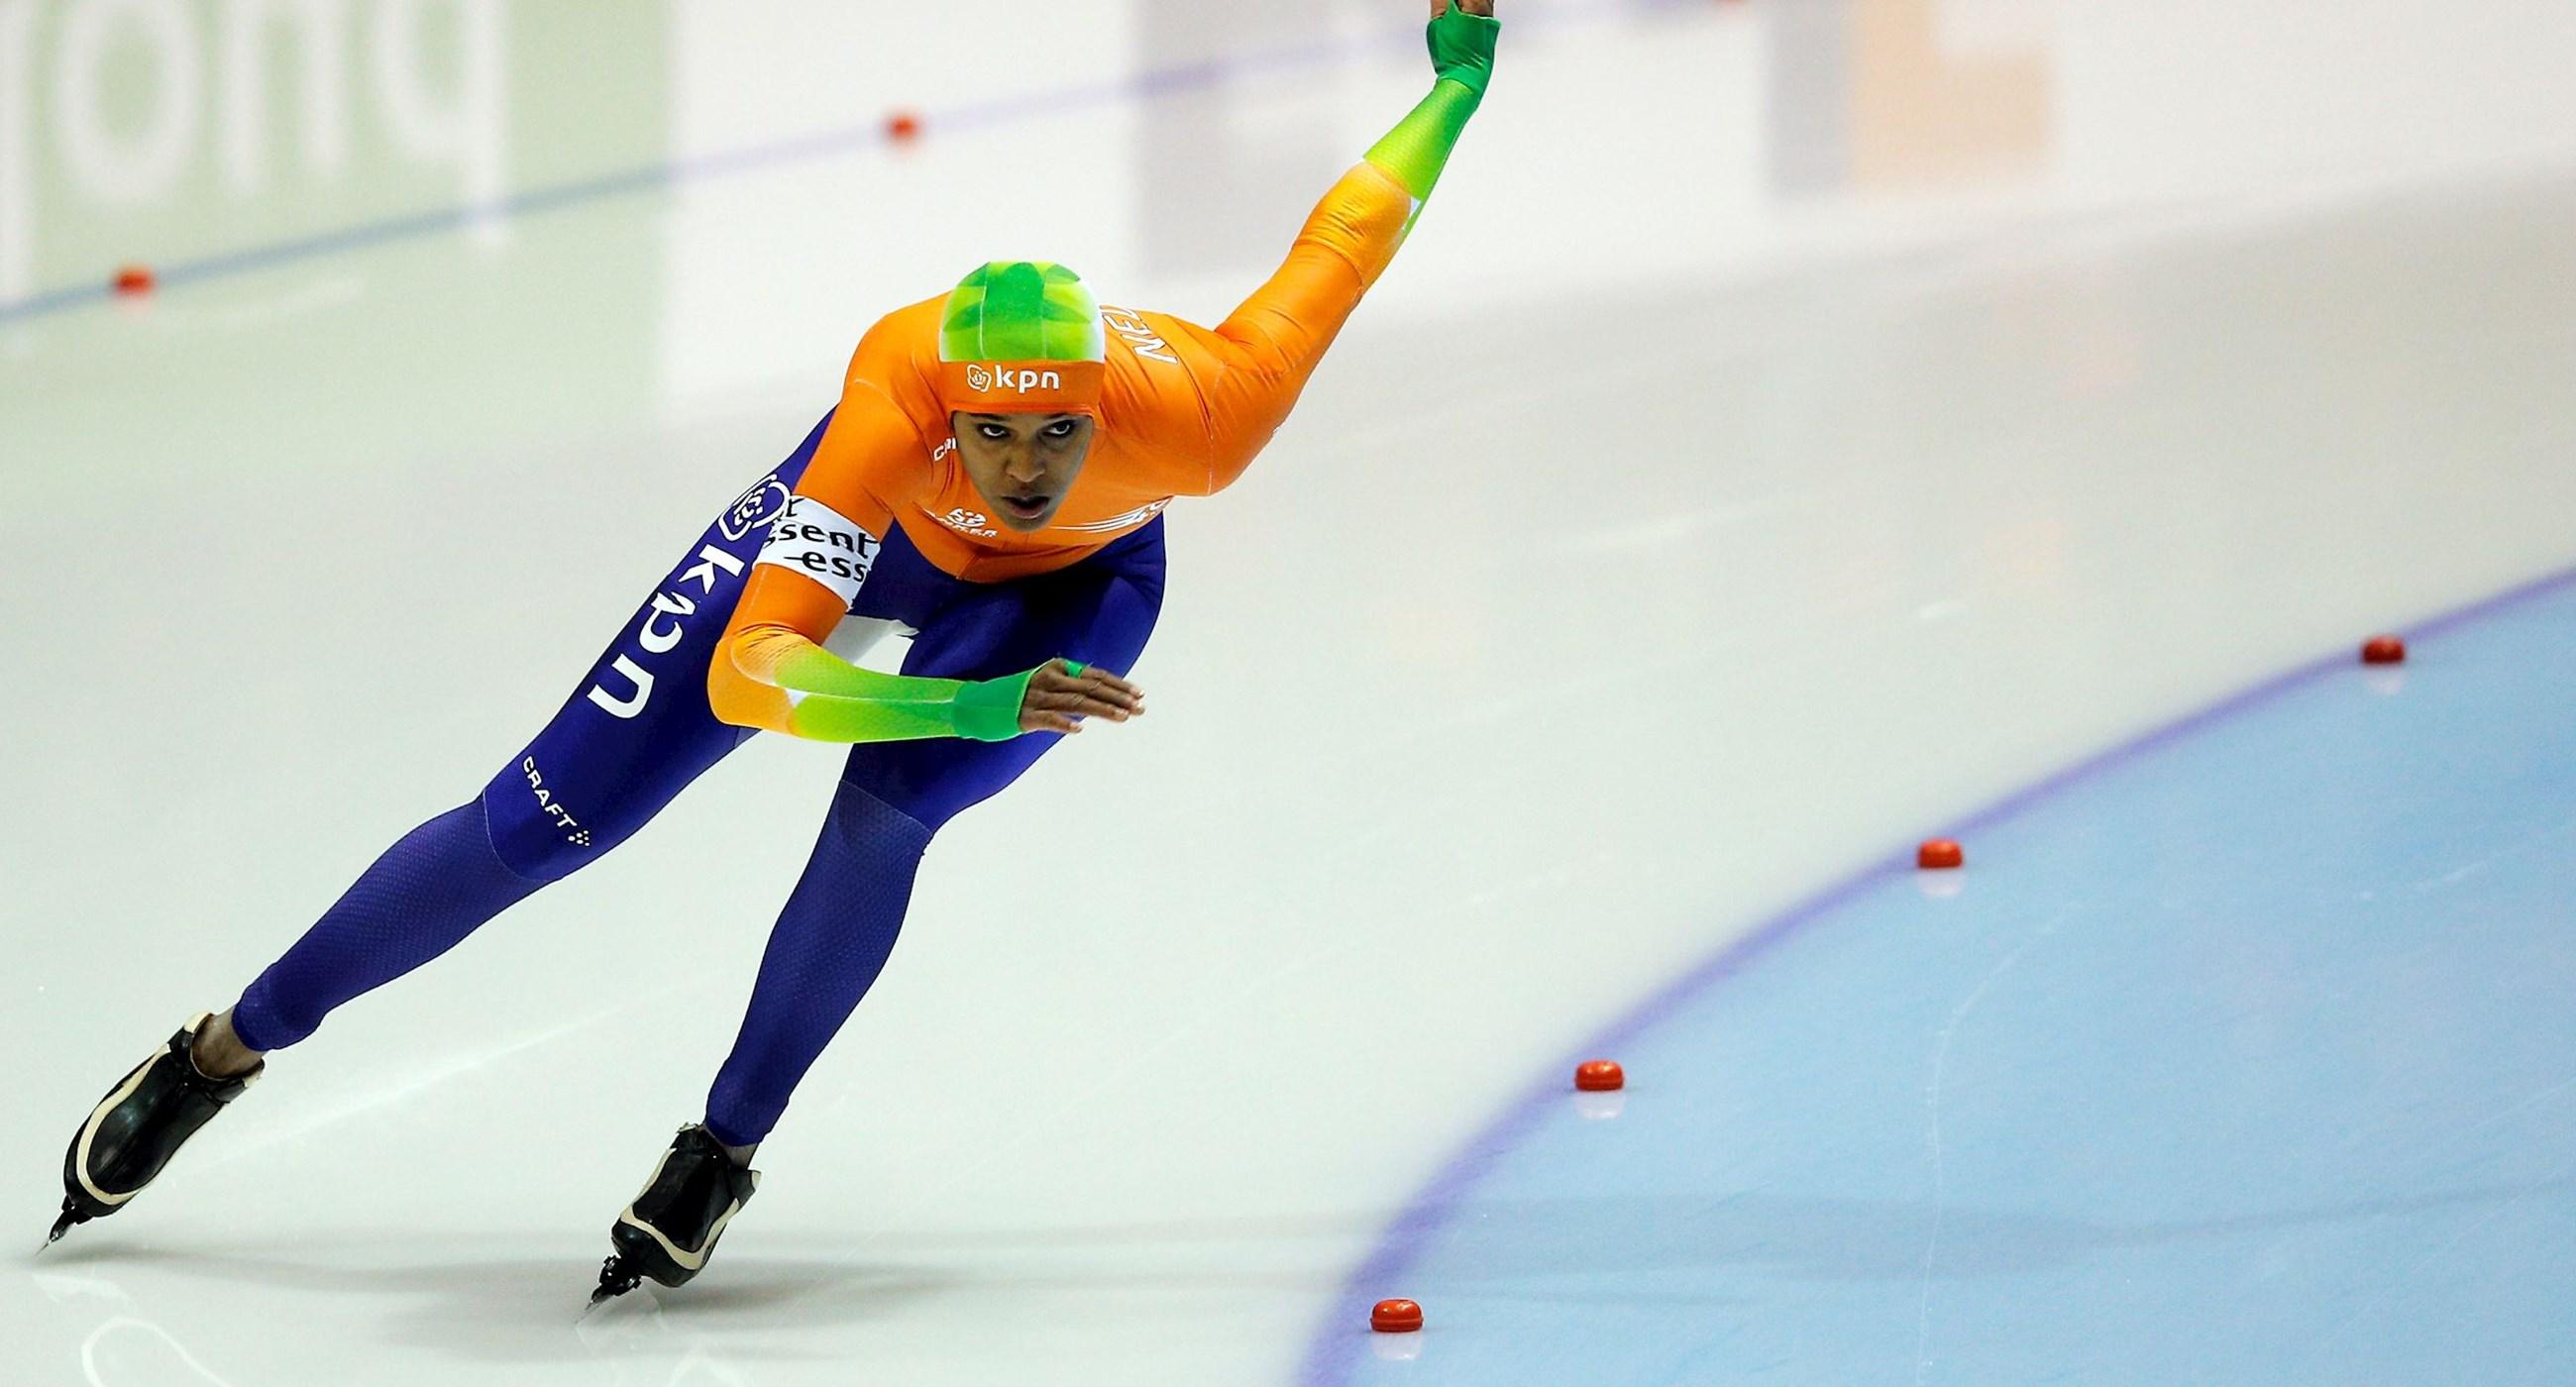 PyeongChang 2018: schaatsen 500 m (v)